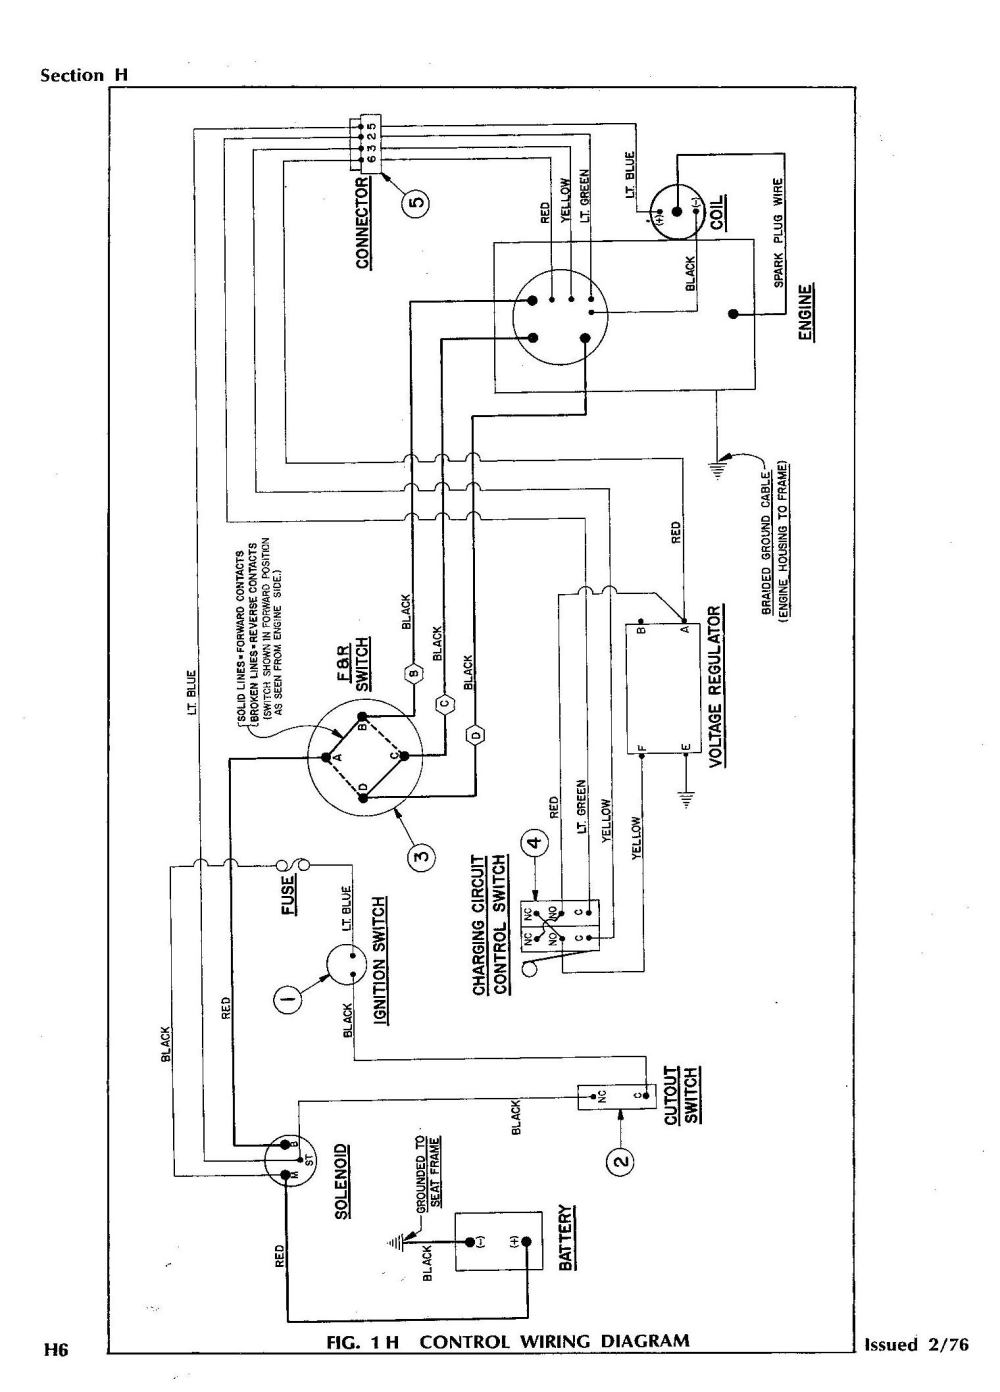 medium resolution of kart steering diagram on harley davidson golf cart gas engine harley davidson golf cart engine diagram